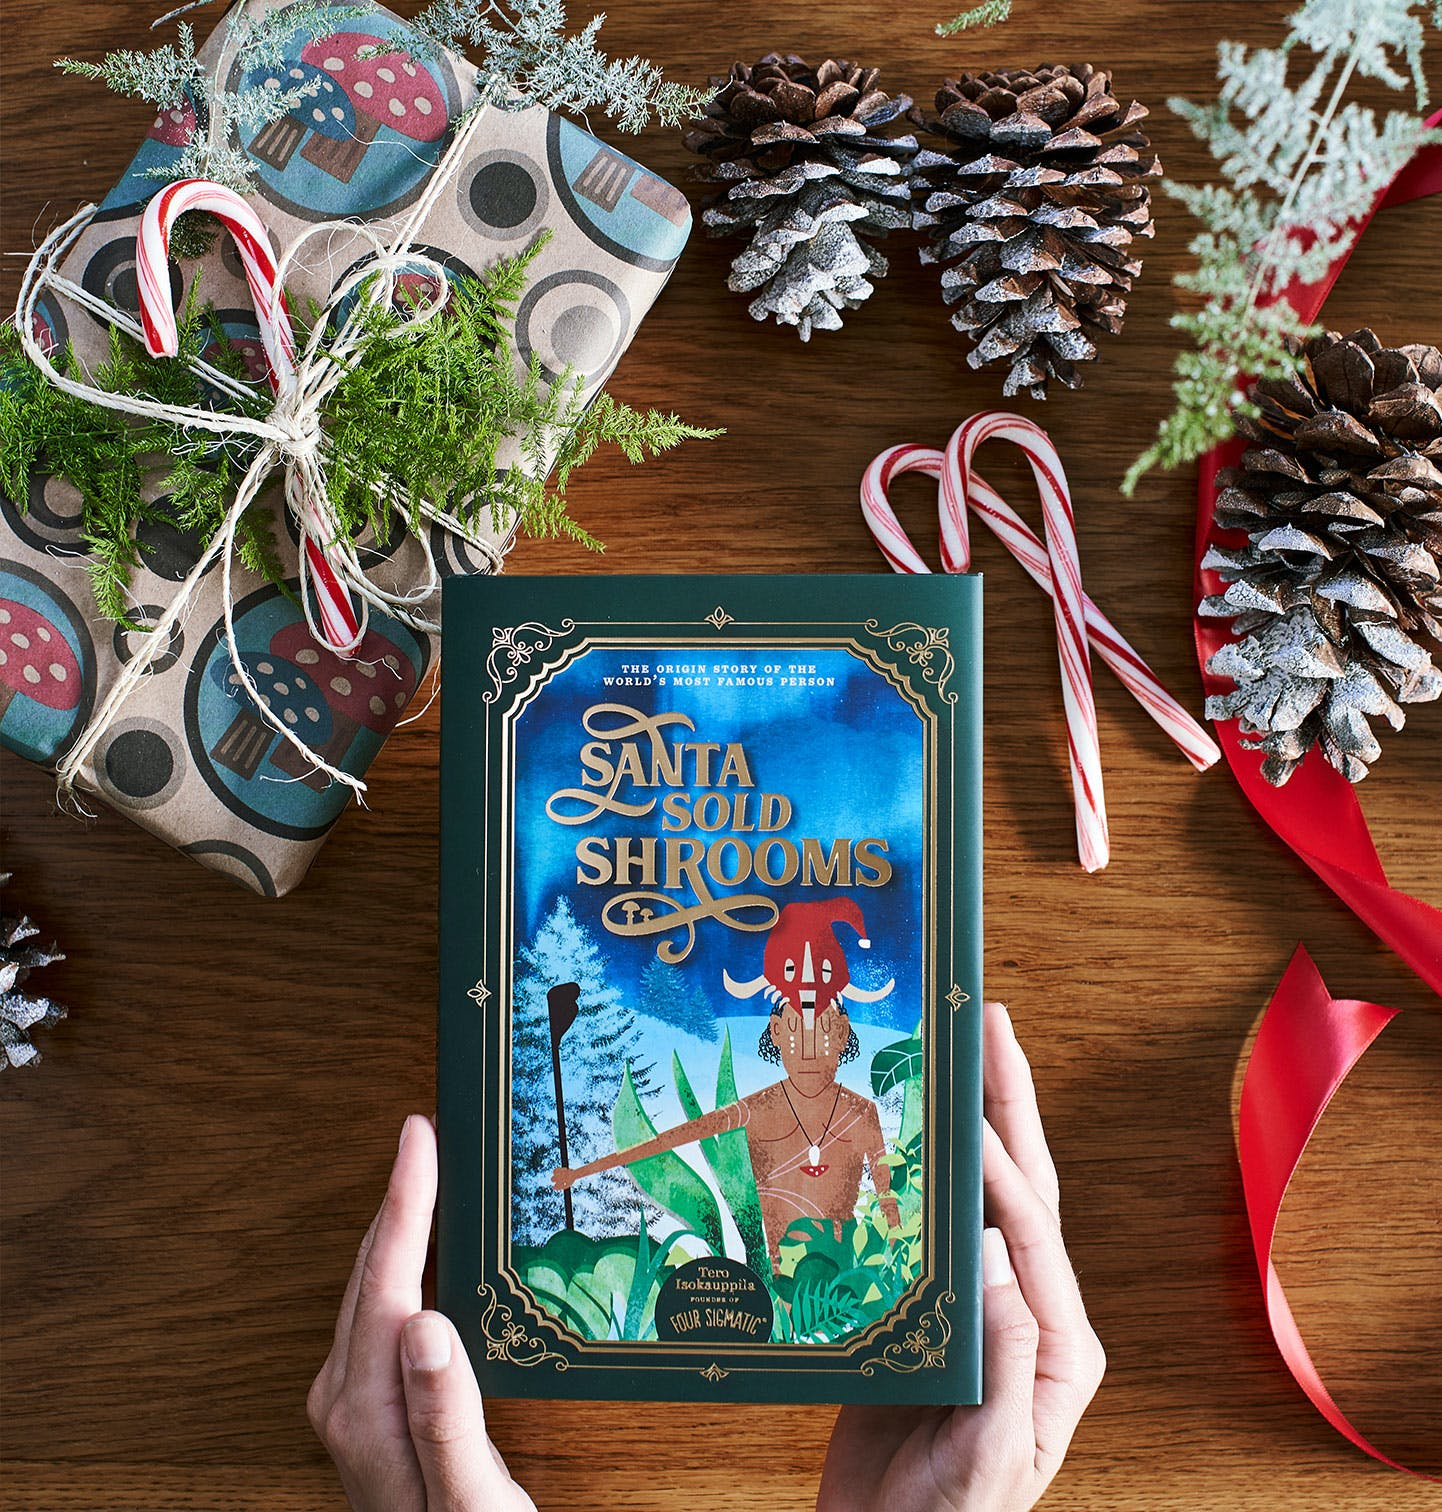 Santa Sold Shrooms Book